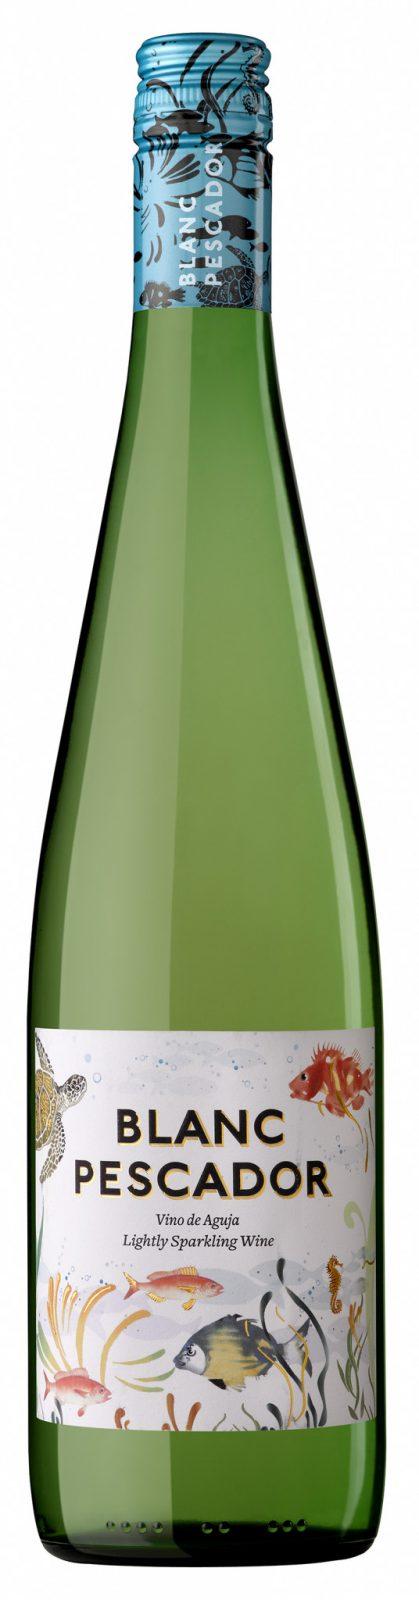 Blanc Pescador_wineaffair